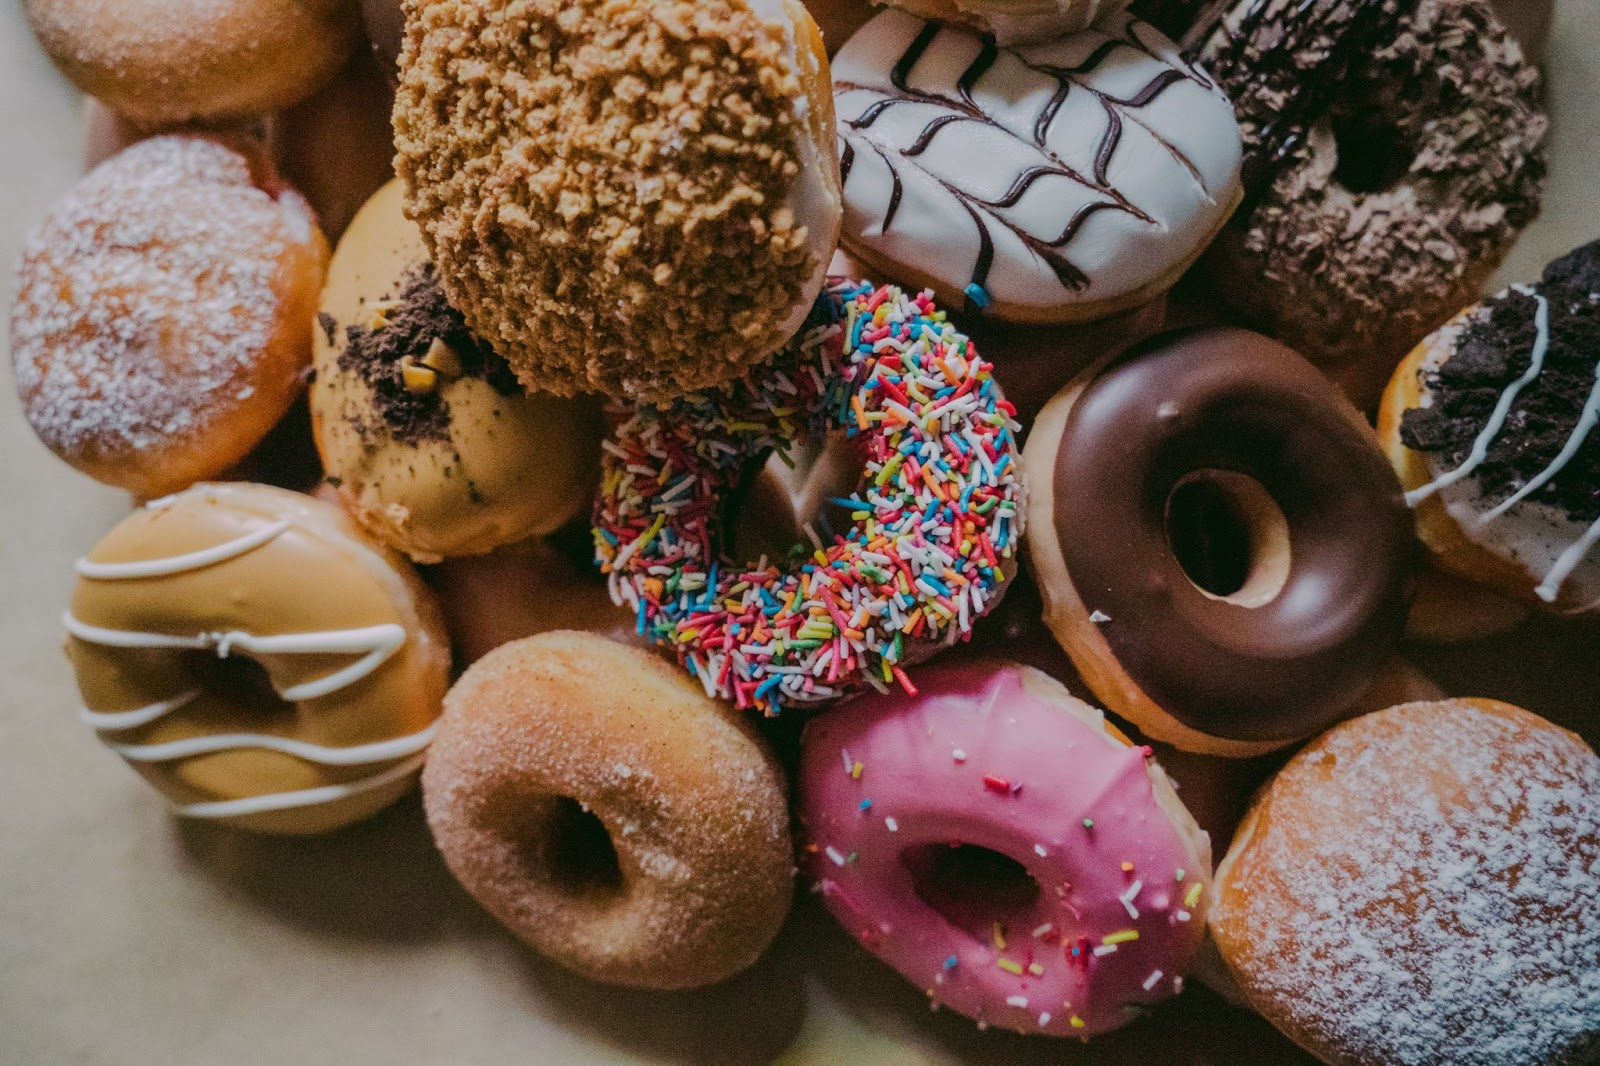 how sugars reduce immunity